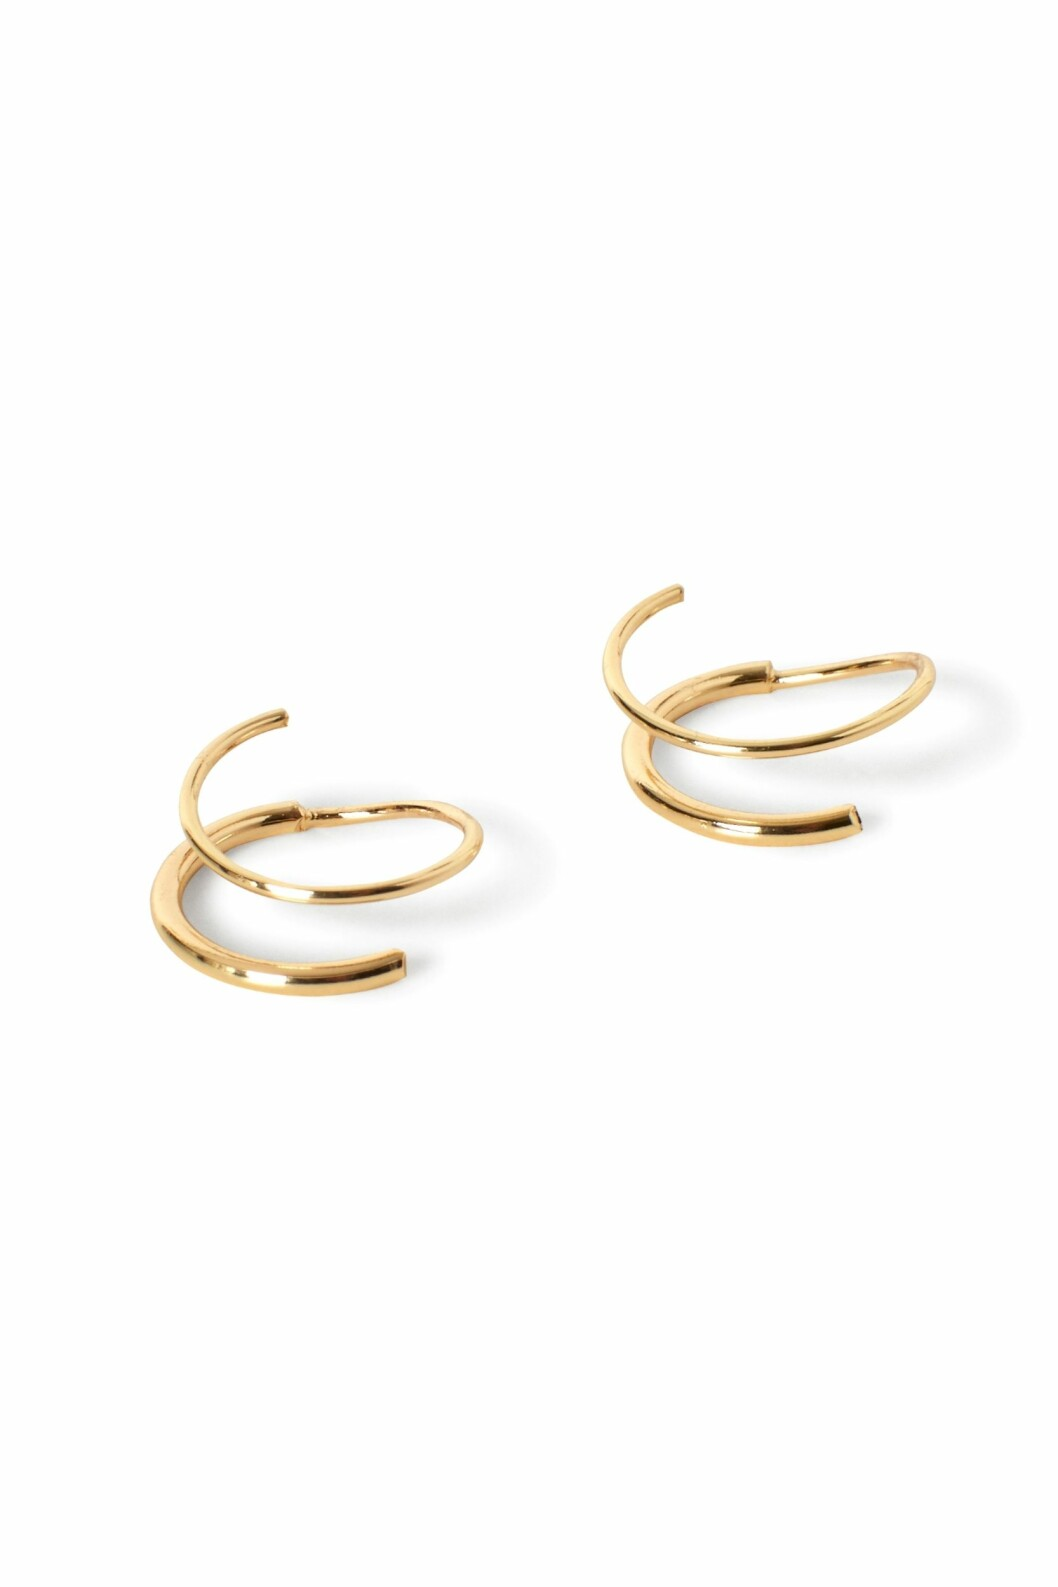 <strong>Øredobber fra Weekday | kr 60 | http:</strong>//shop.weekday.com/se/Womens_shop/Jewellery/Lap_Earrings/10873262-8199449.1#c-49929